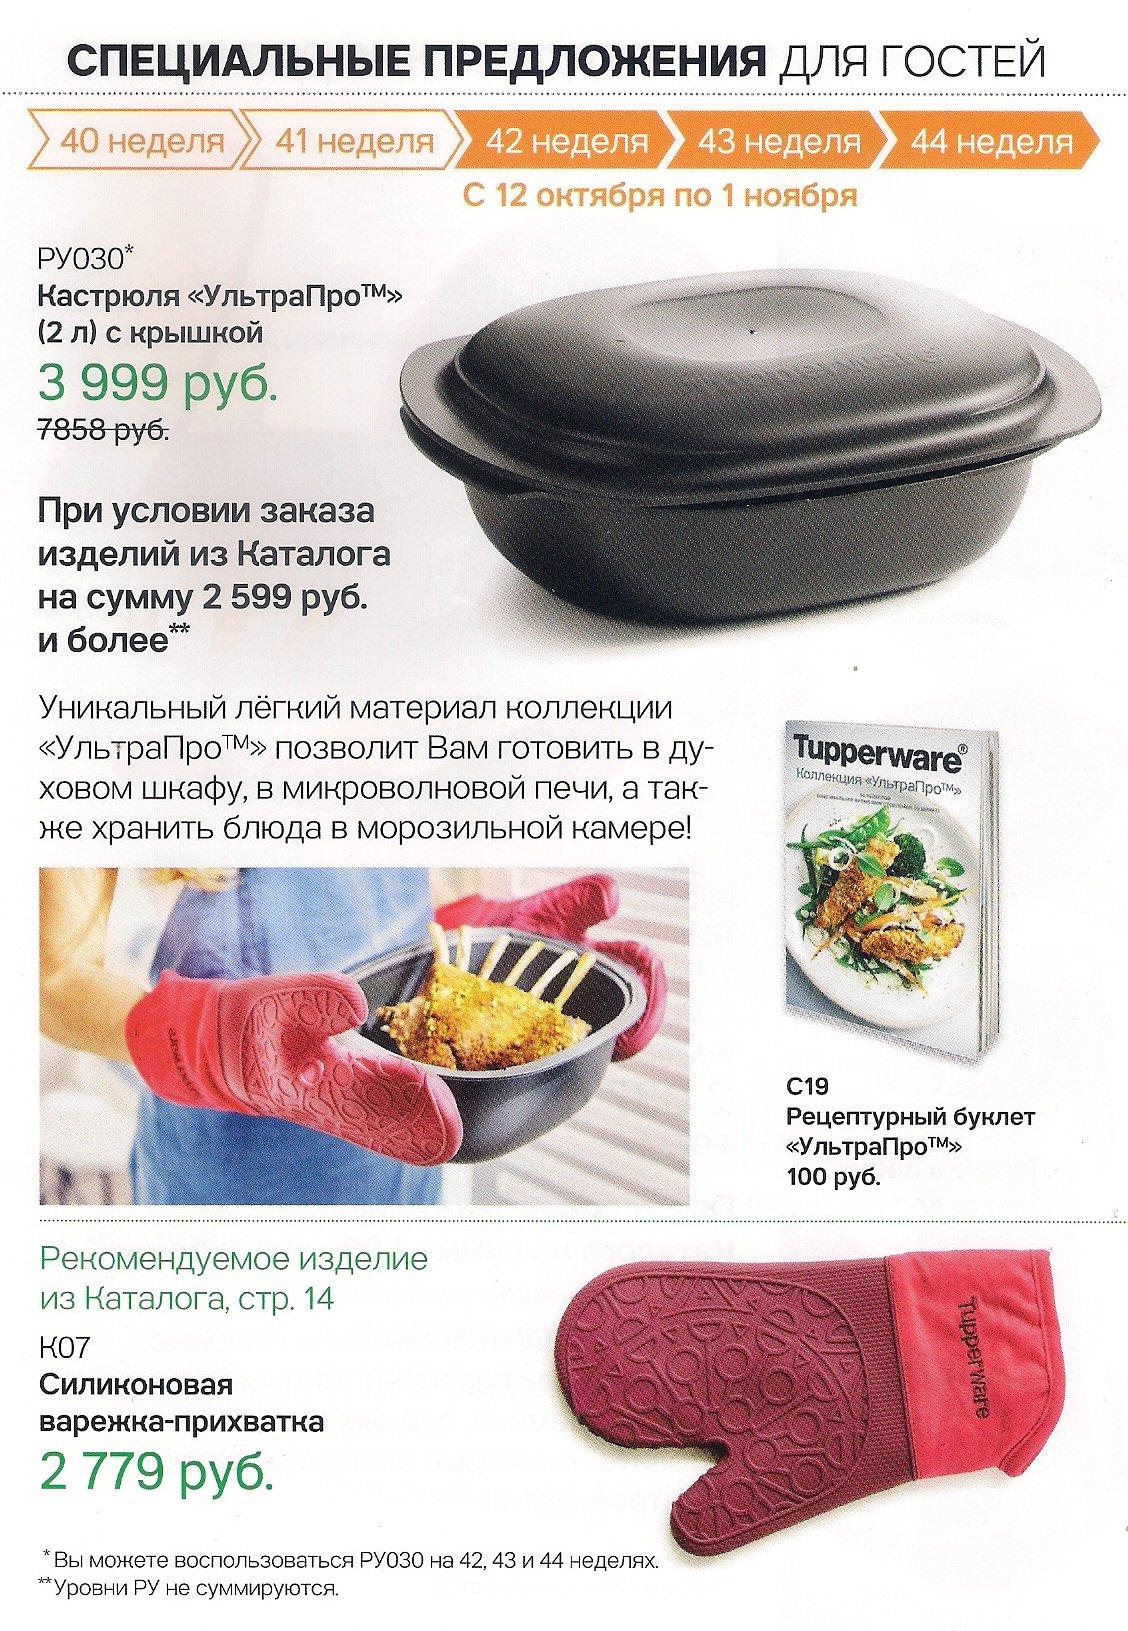 http://tupperware-online.ru/images/upload/14d%20(2).jpg